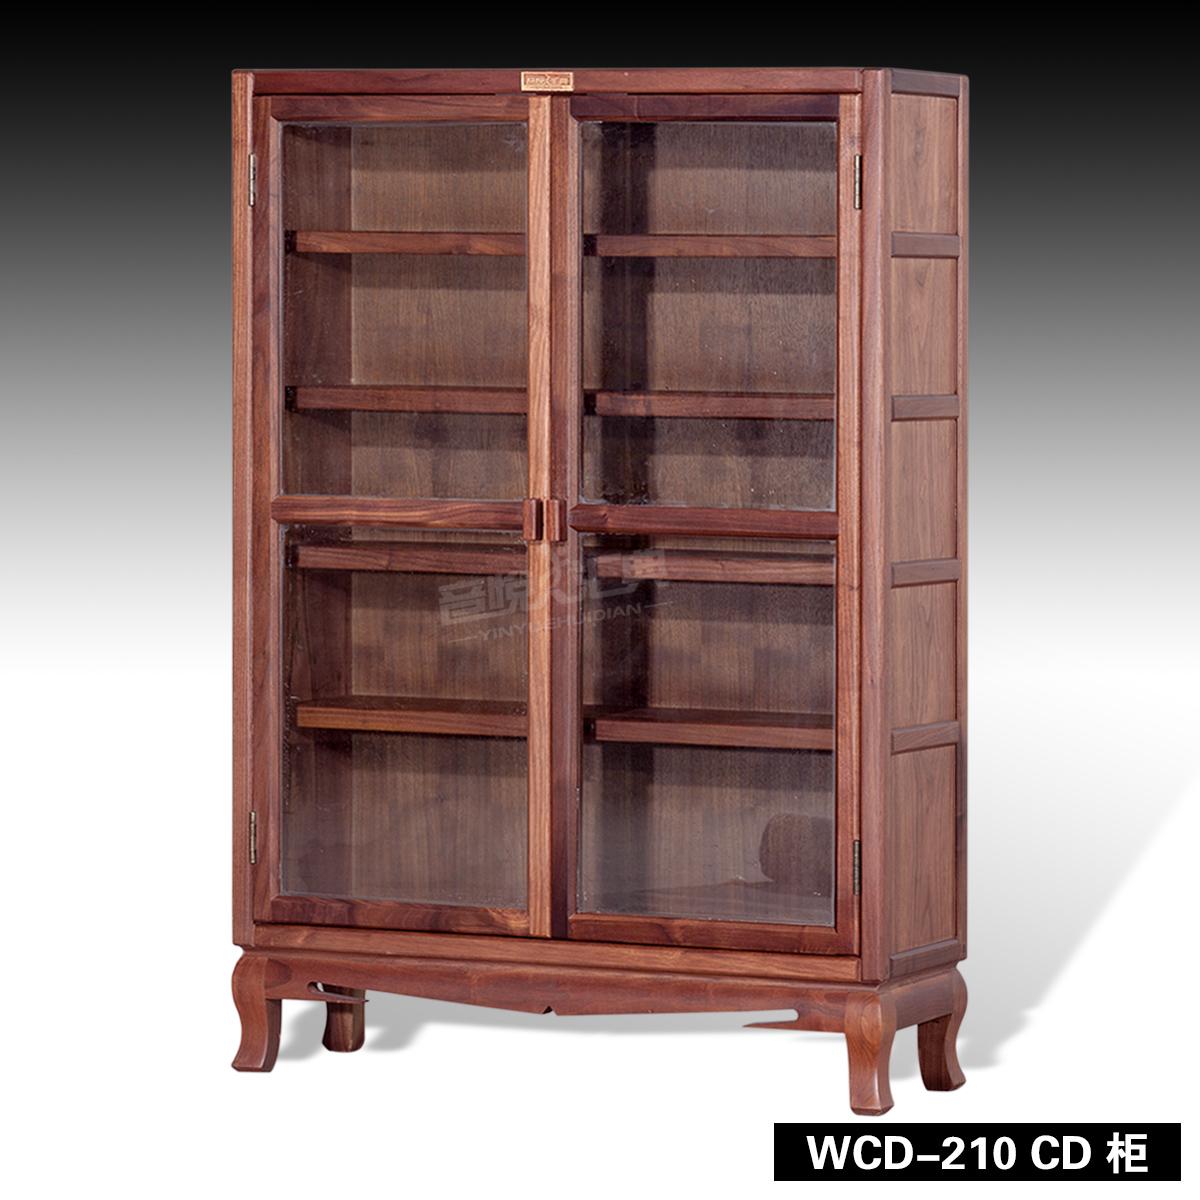 Yin Yue Department Code Wcd 210 Glass Doors Wood Cd Cabinet Cd